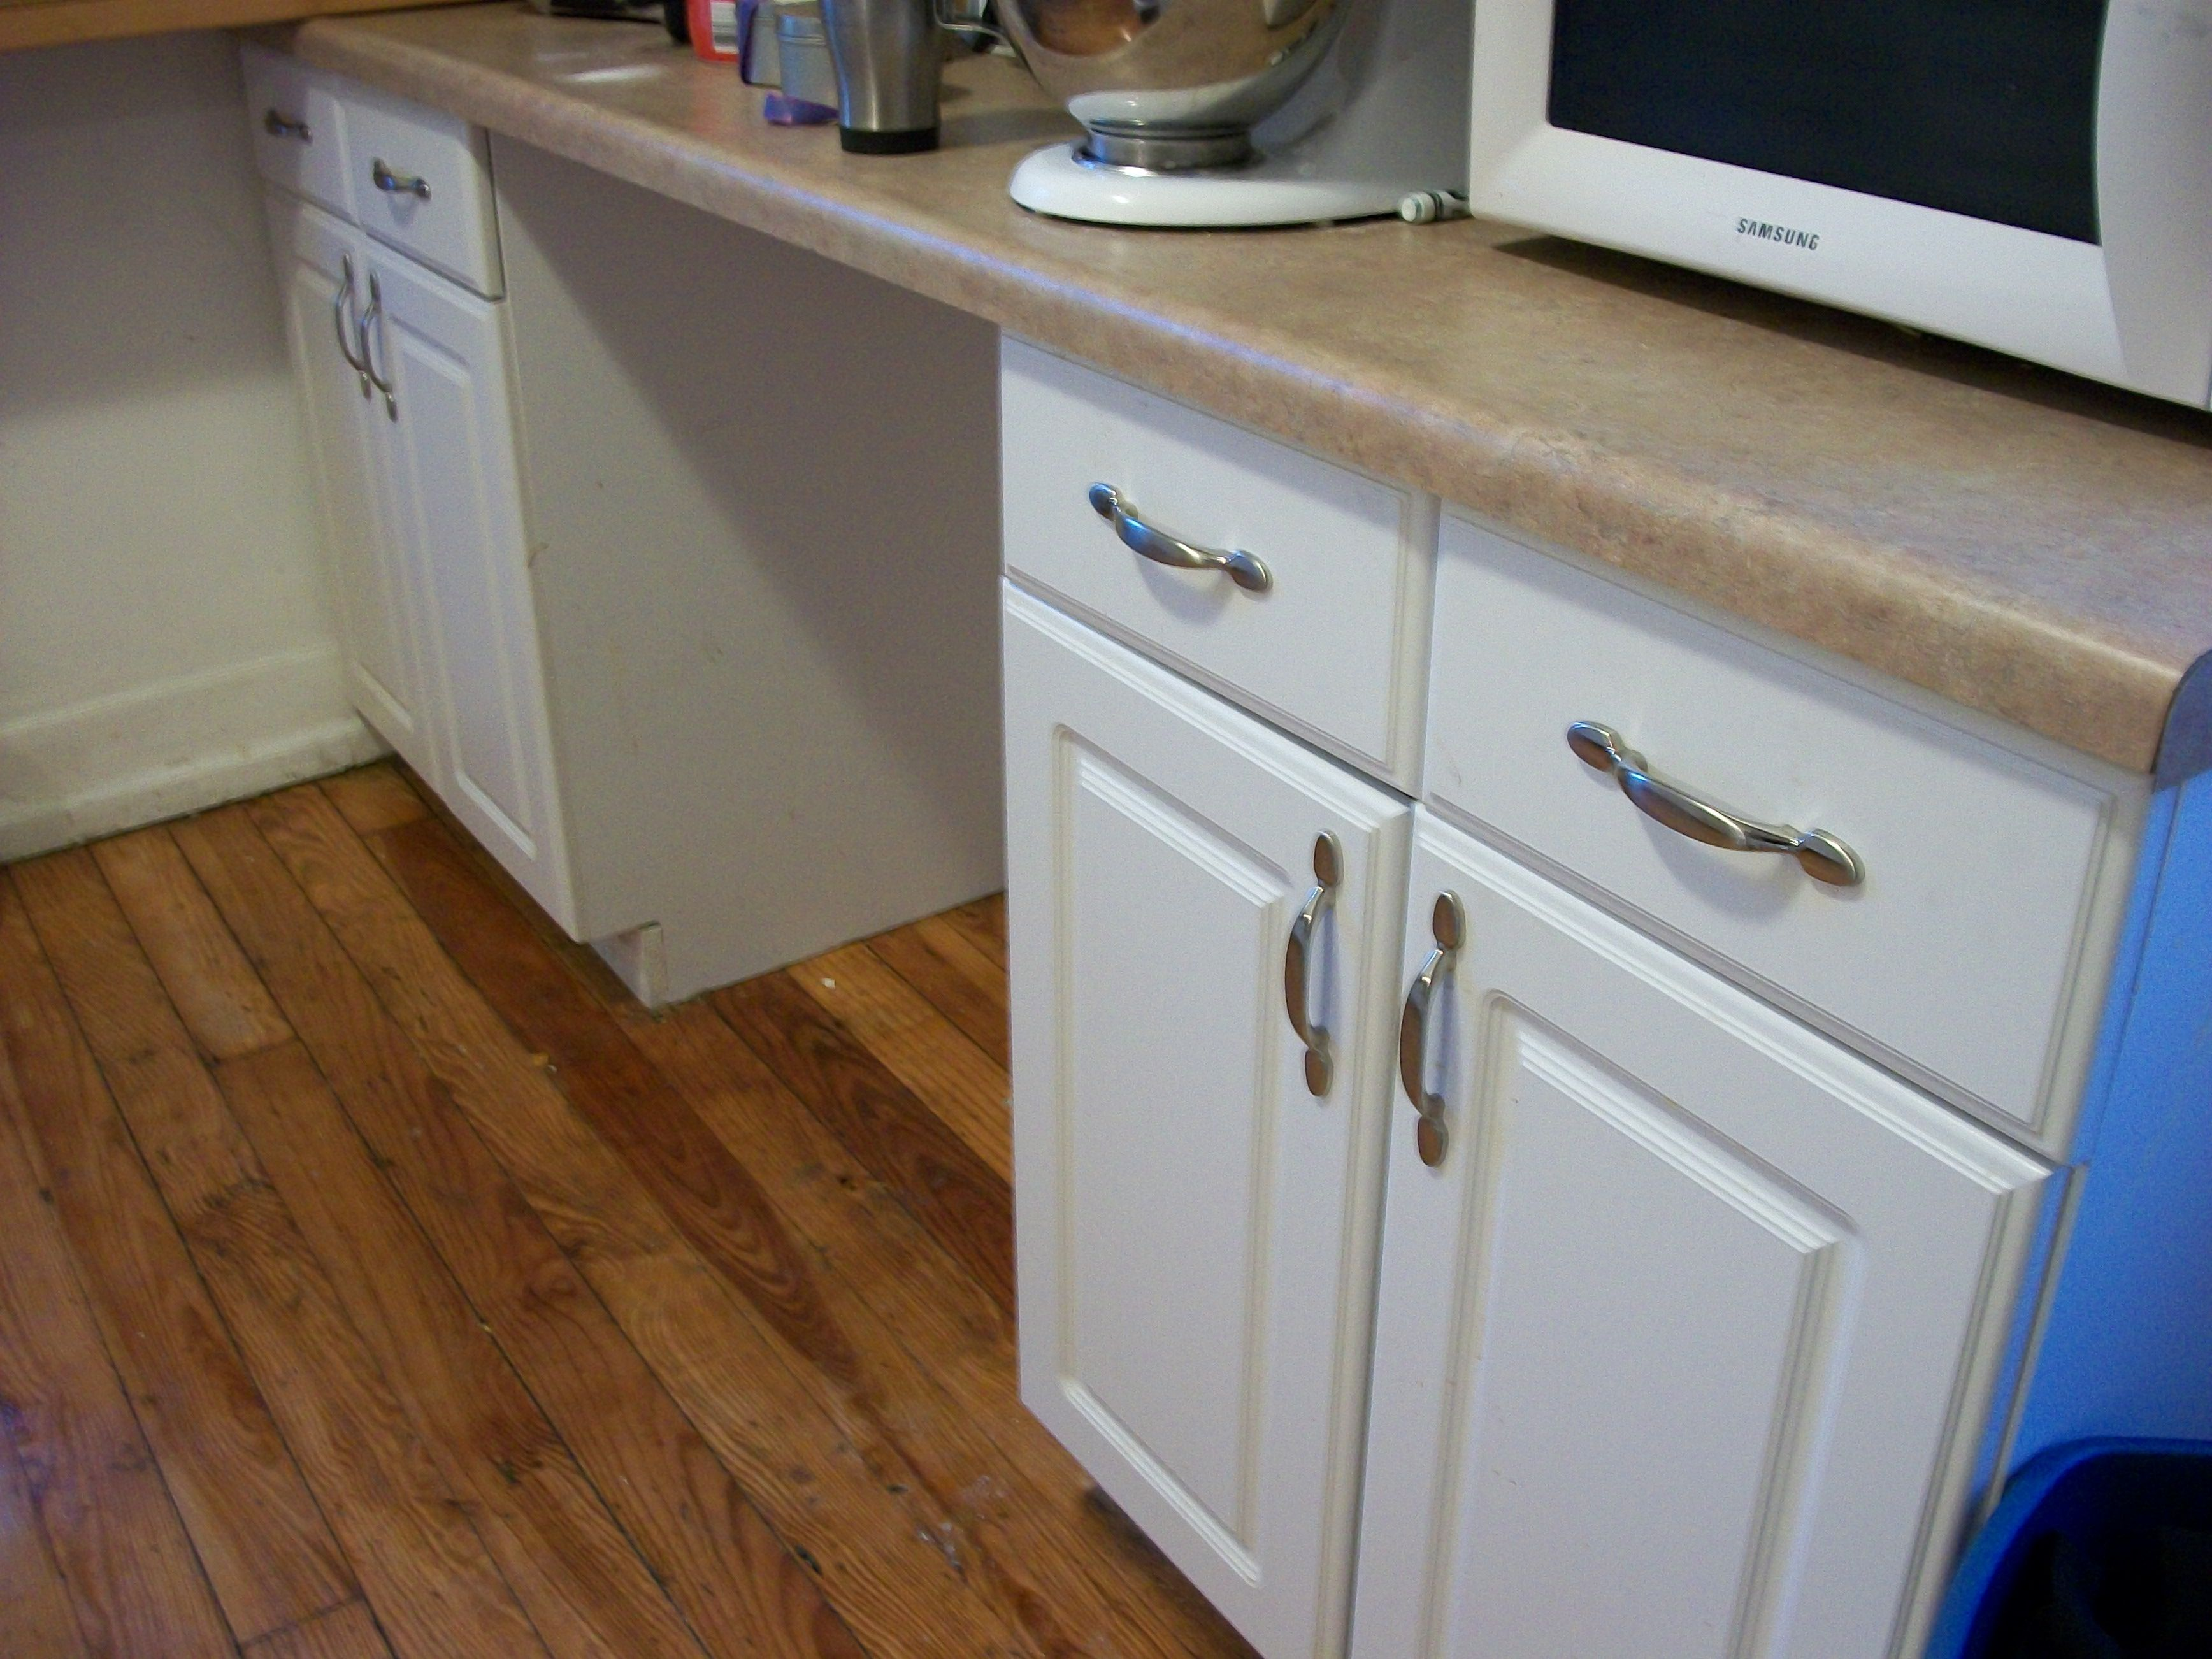 Handyman Kitchen Cabinets Kitchen Cabinet Design Stock Space Kitchen Cabinet Drawers Handyman Used Kitchen Cabinets Kitchen Cabinets Kitchen Cabinets For Sale